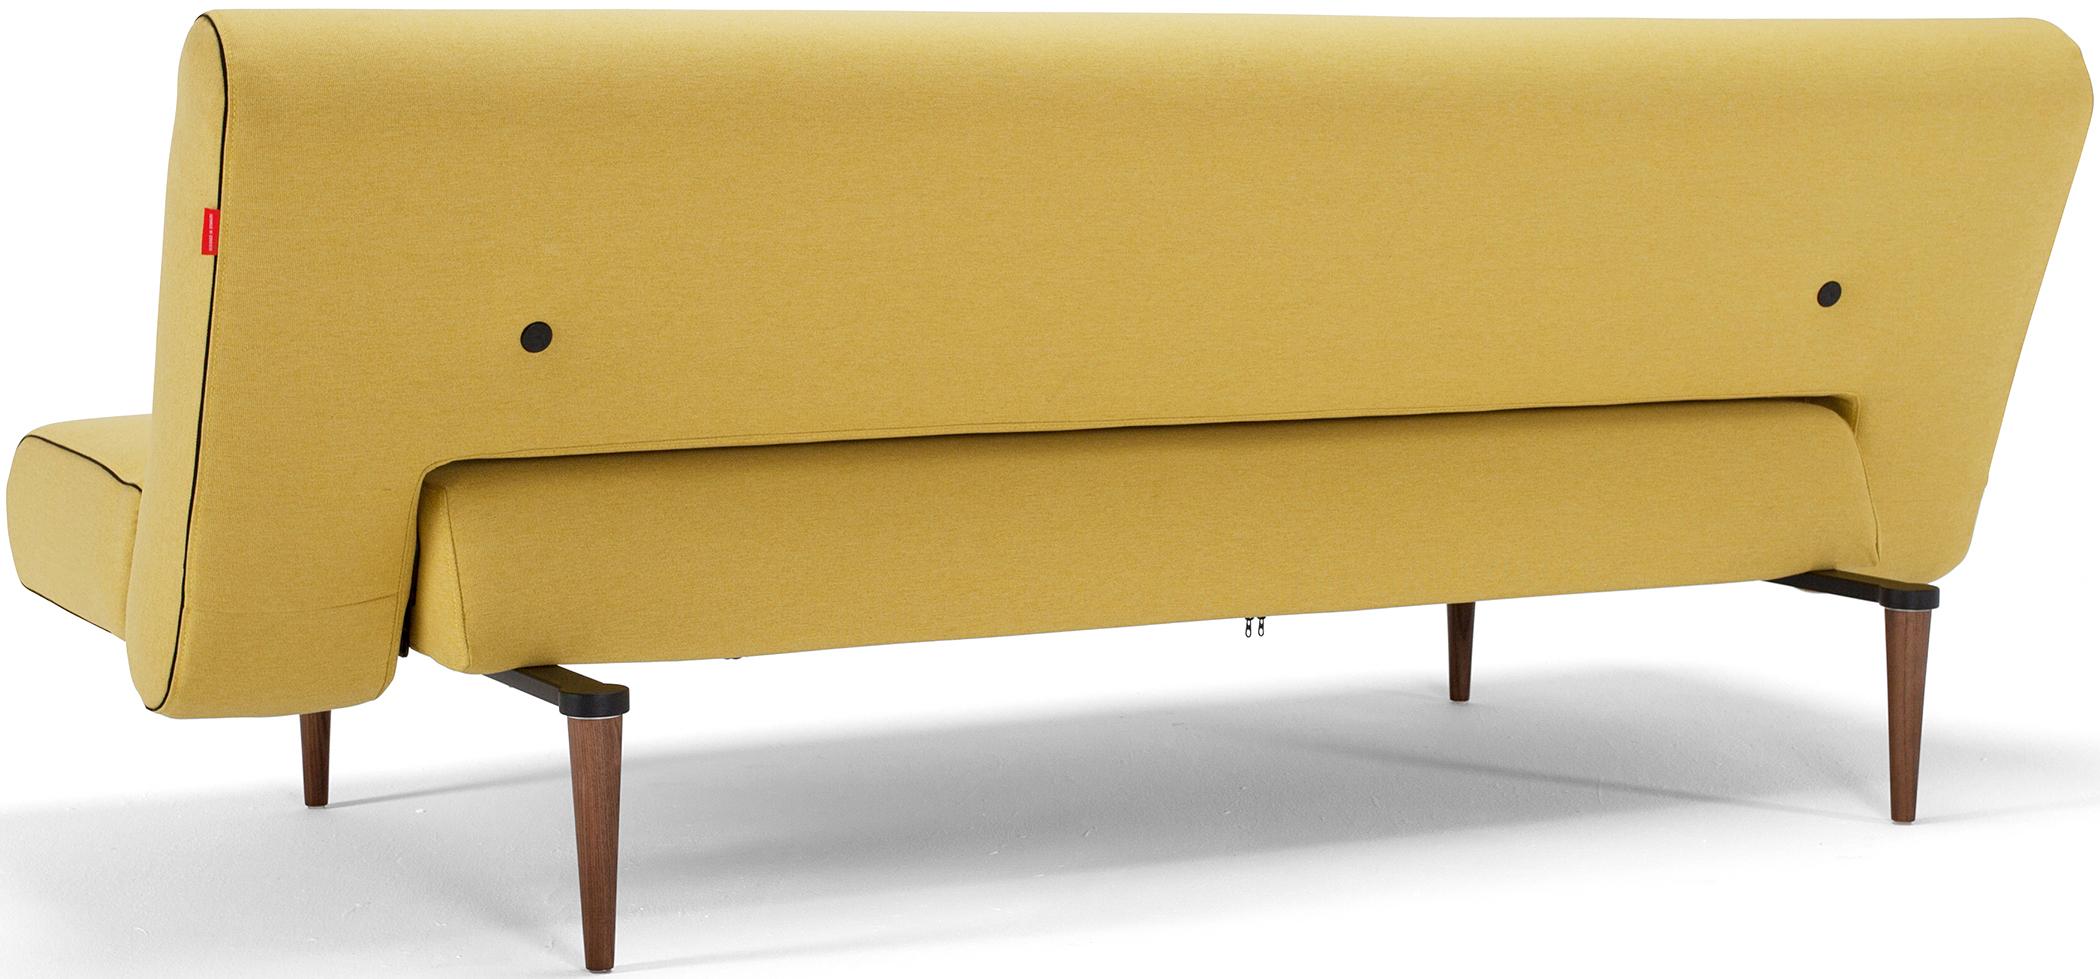 ... Unfurl Sofa Bed Mustard Yellow